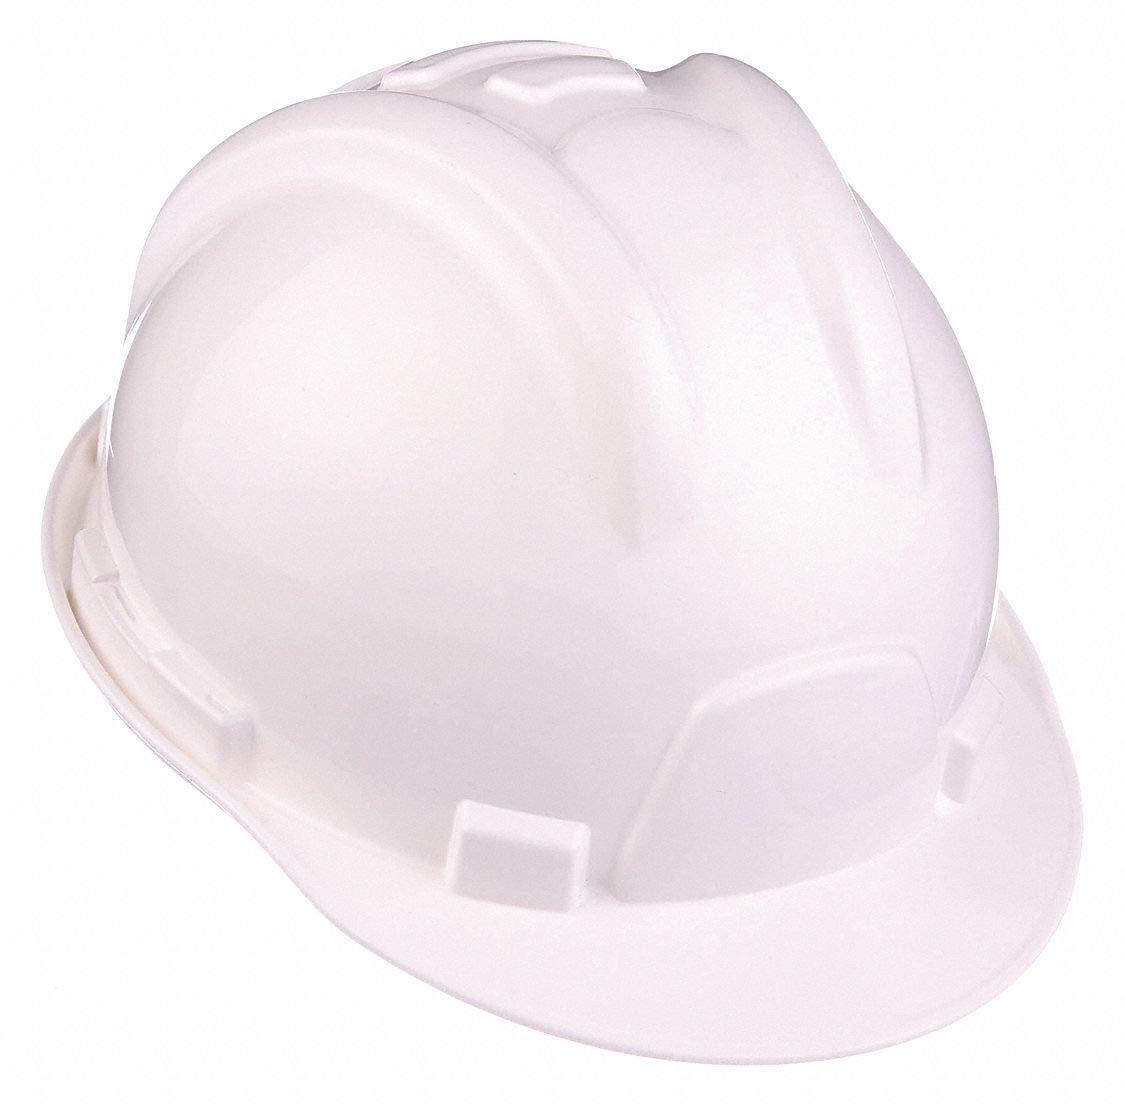 Hard Hat, White, Front Brim, 6 pt. Ratchet by TASCO